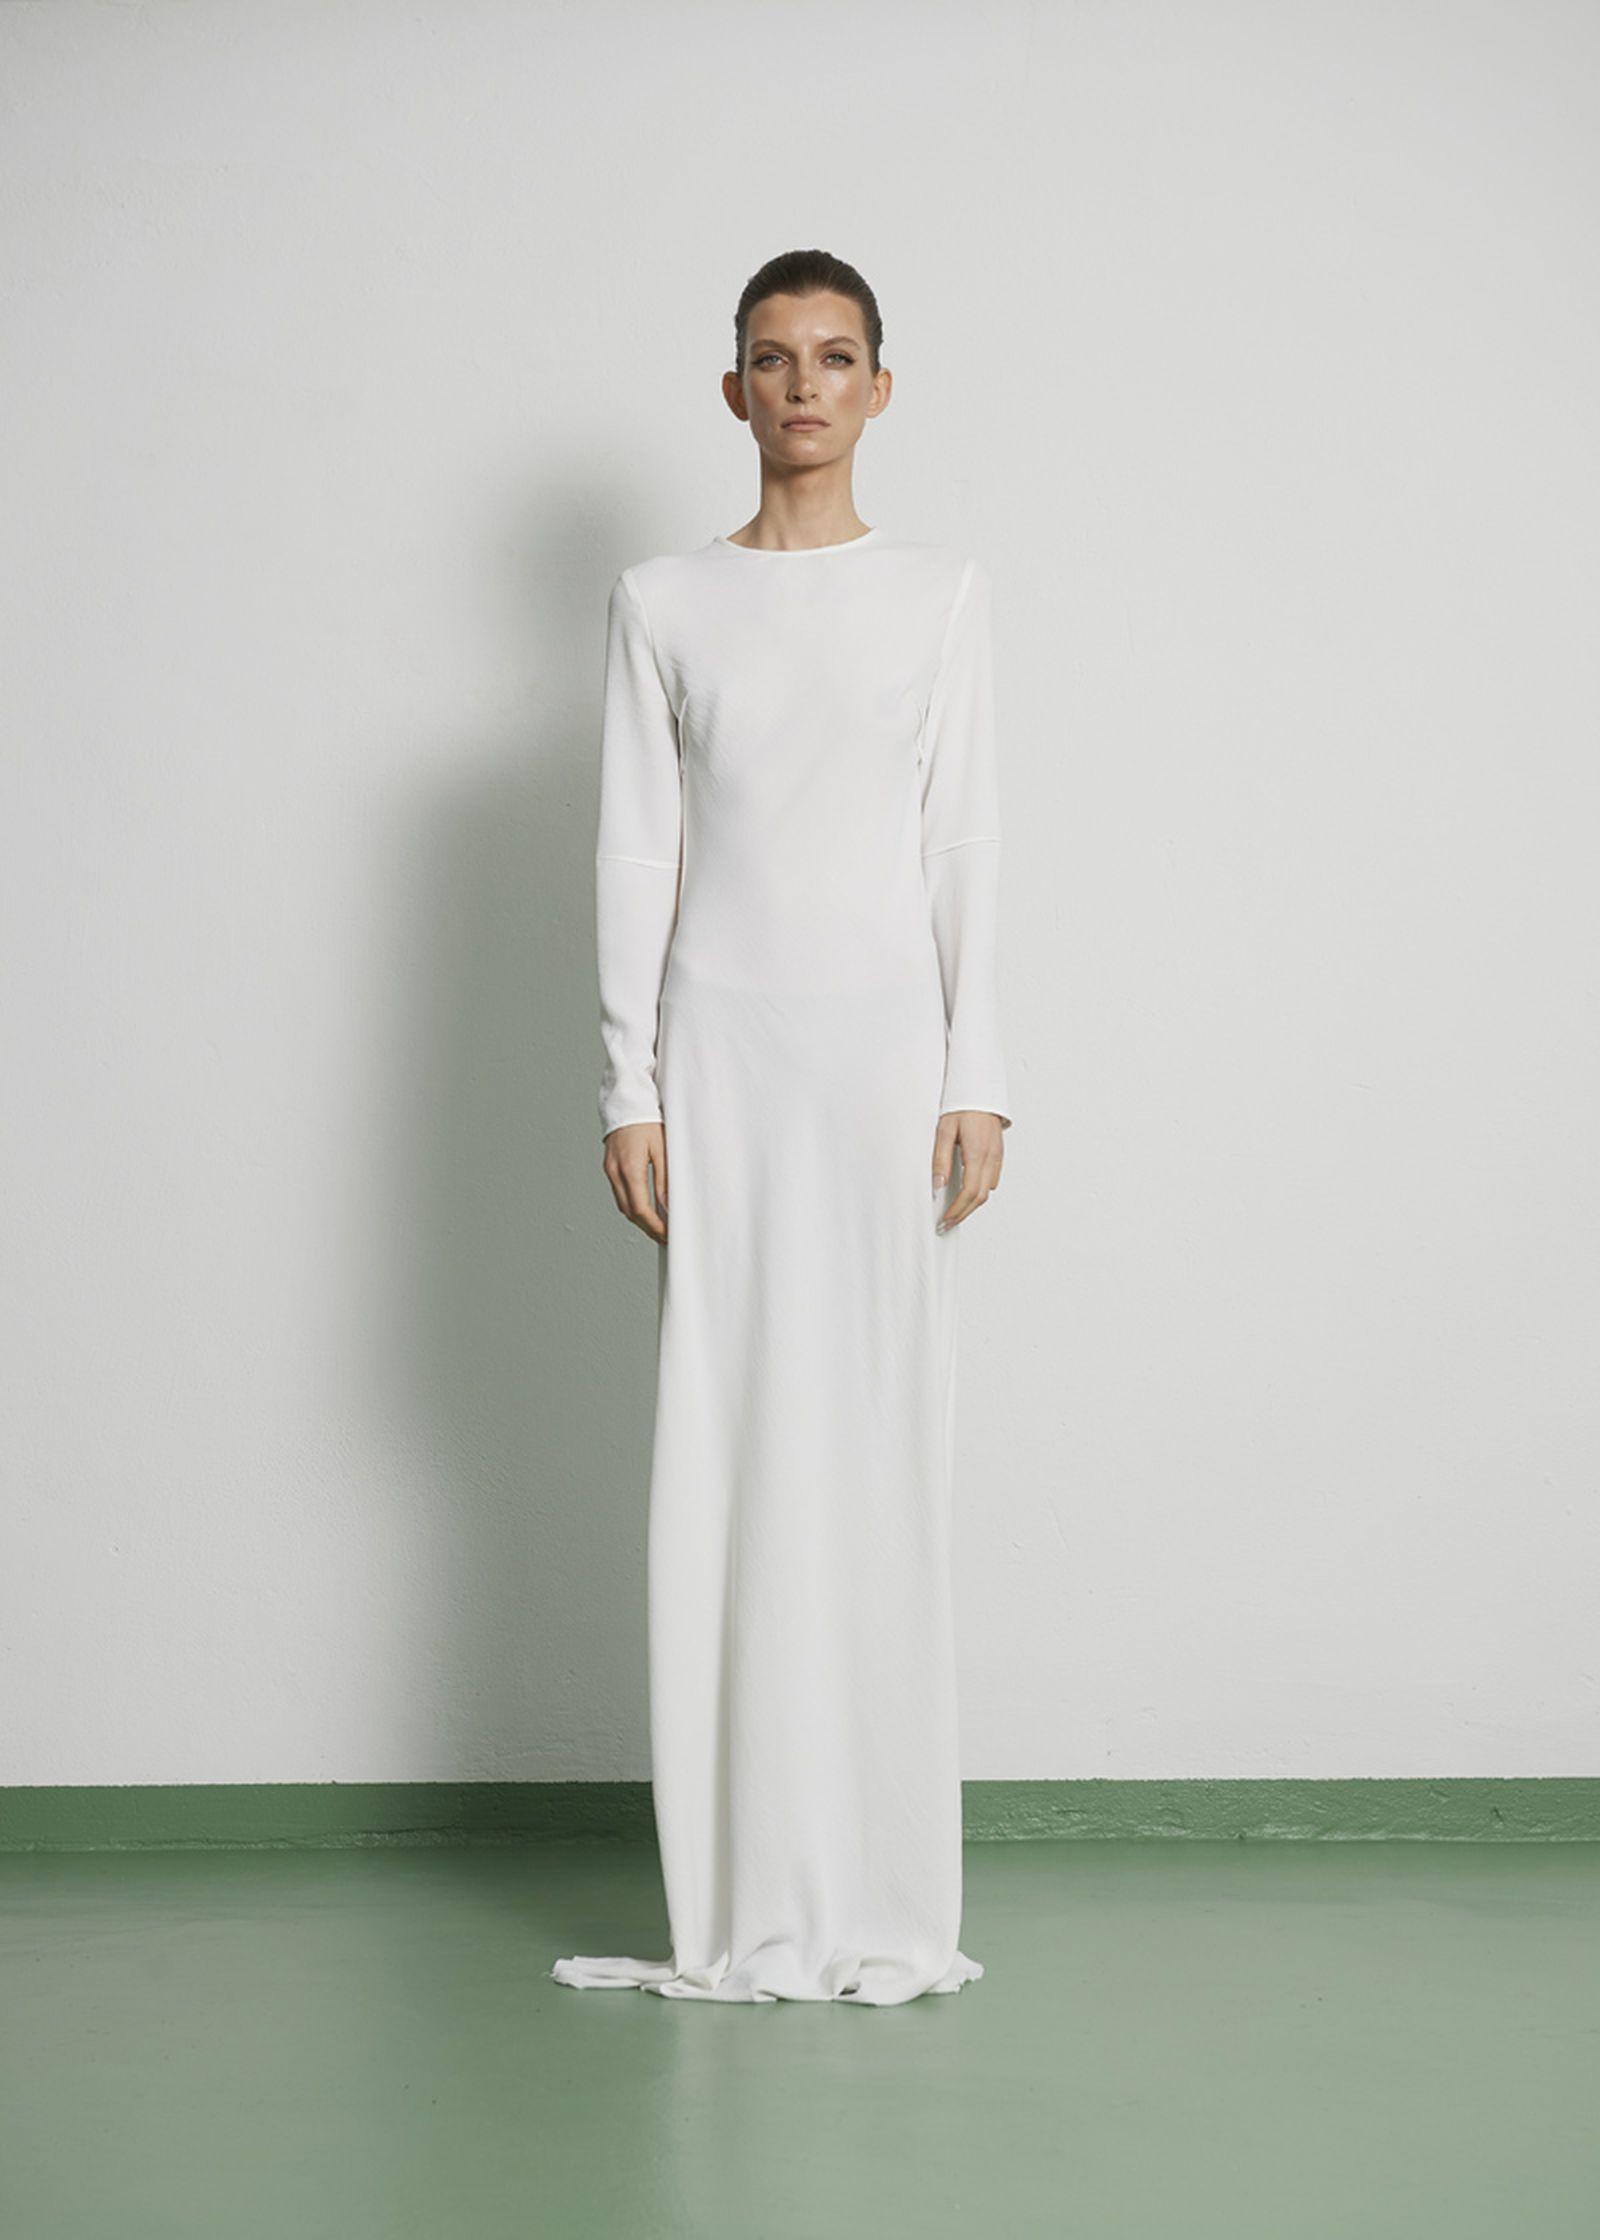 032c-rtw-womenswear-collection-paris-14